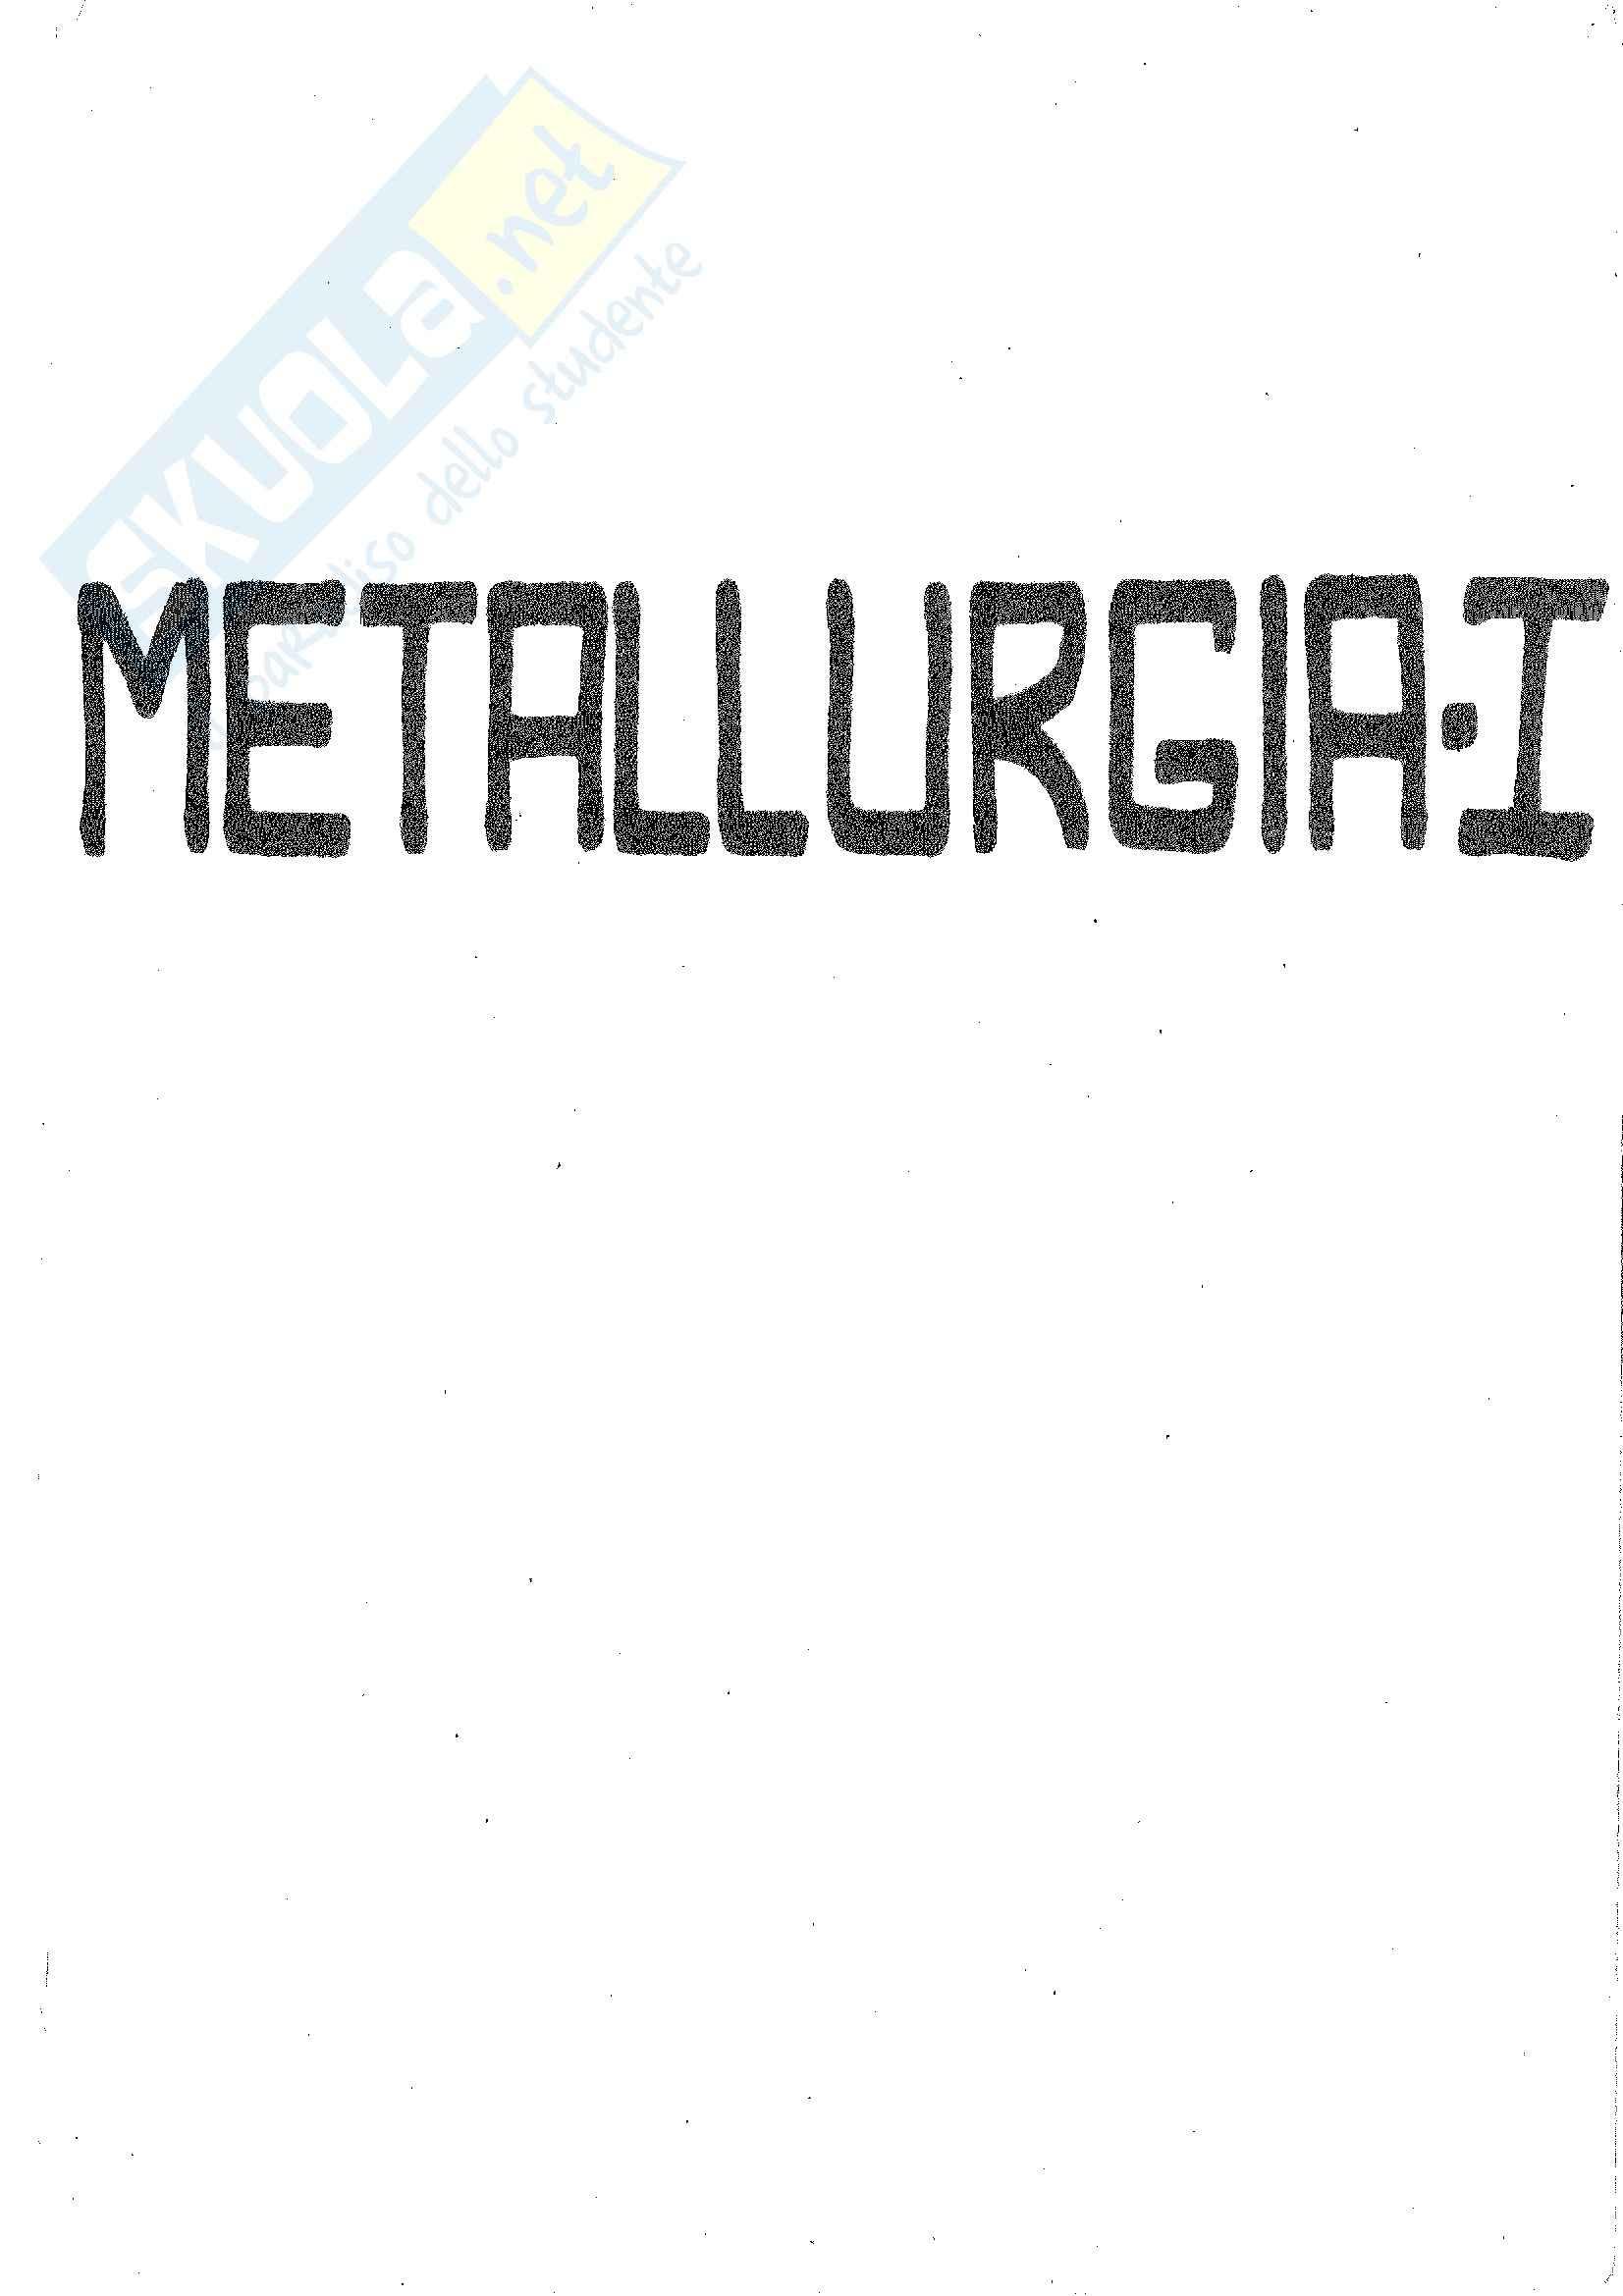 Lezioni: Appunti di Metallurgia